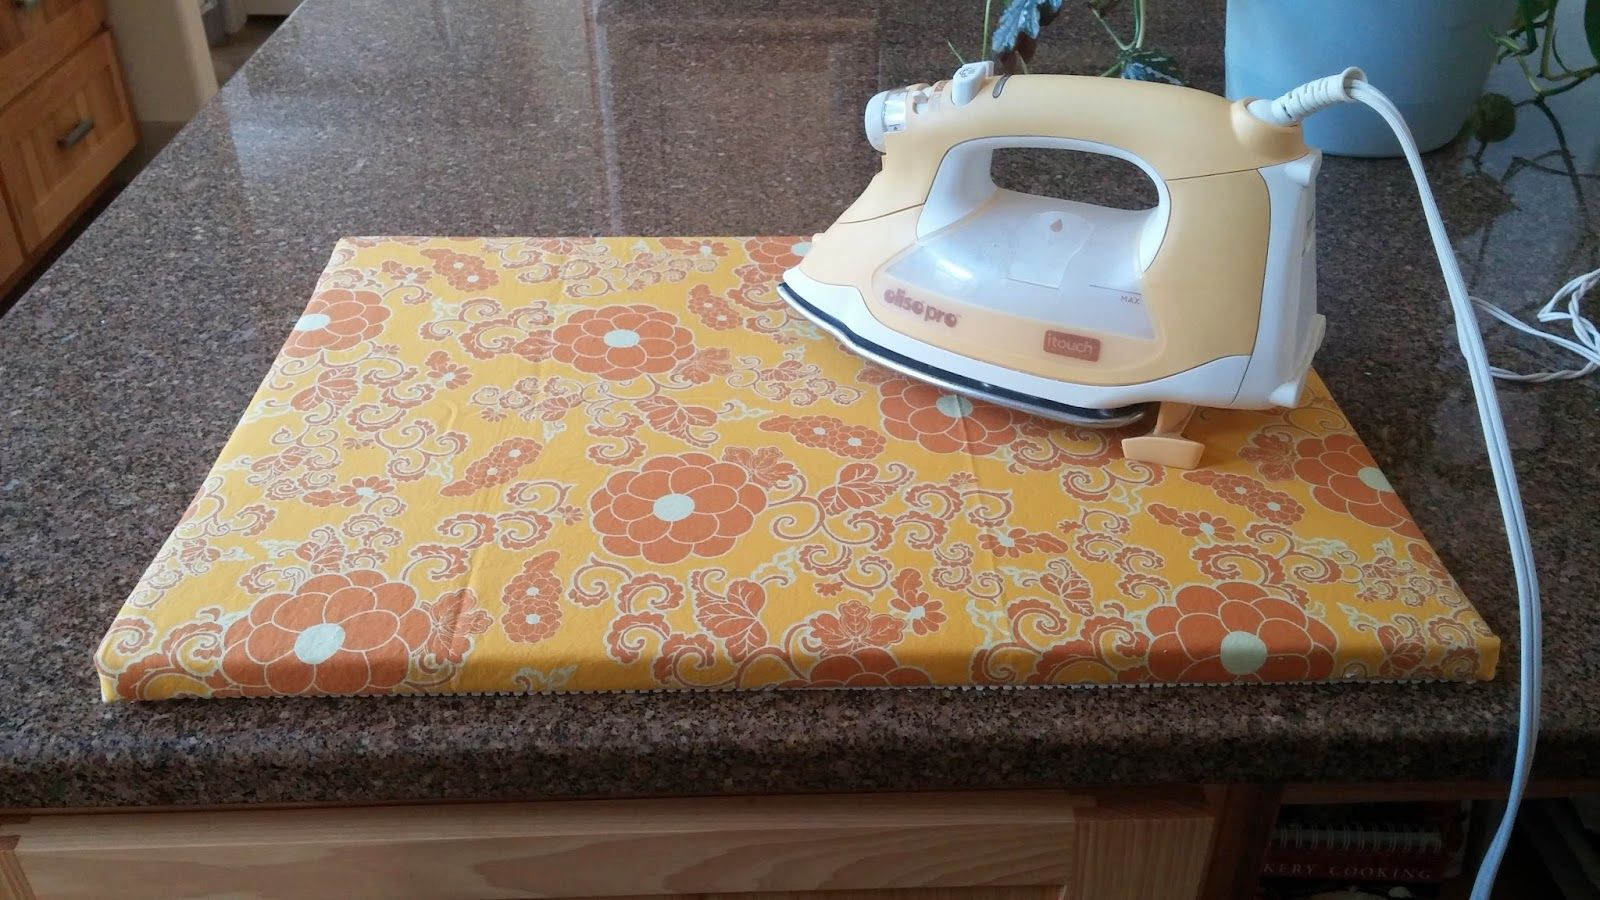 New Portable Countertop Ironing Board Diy Sewing Table Diy